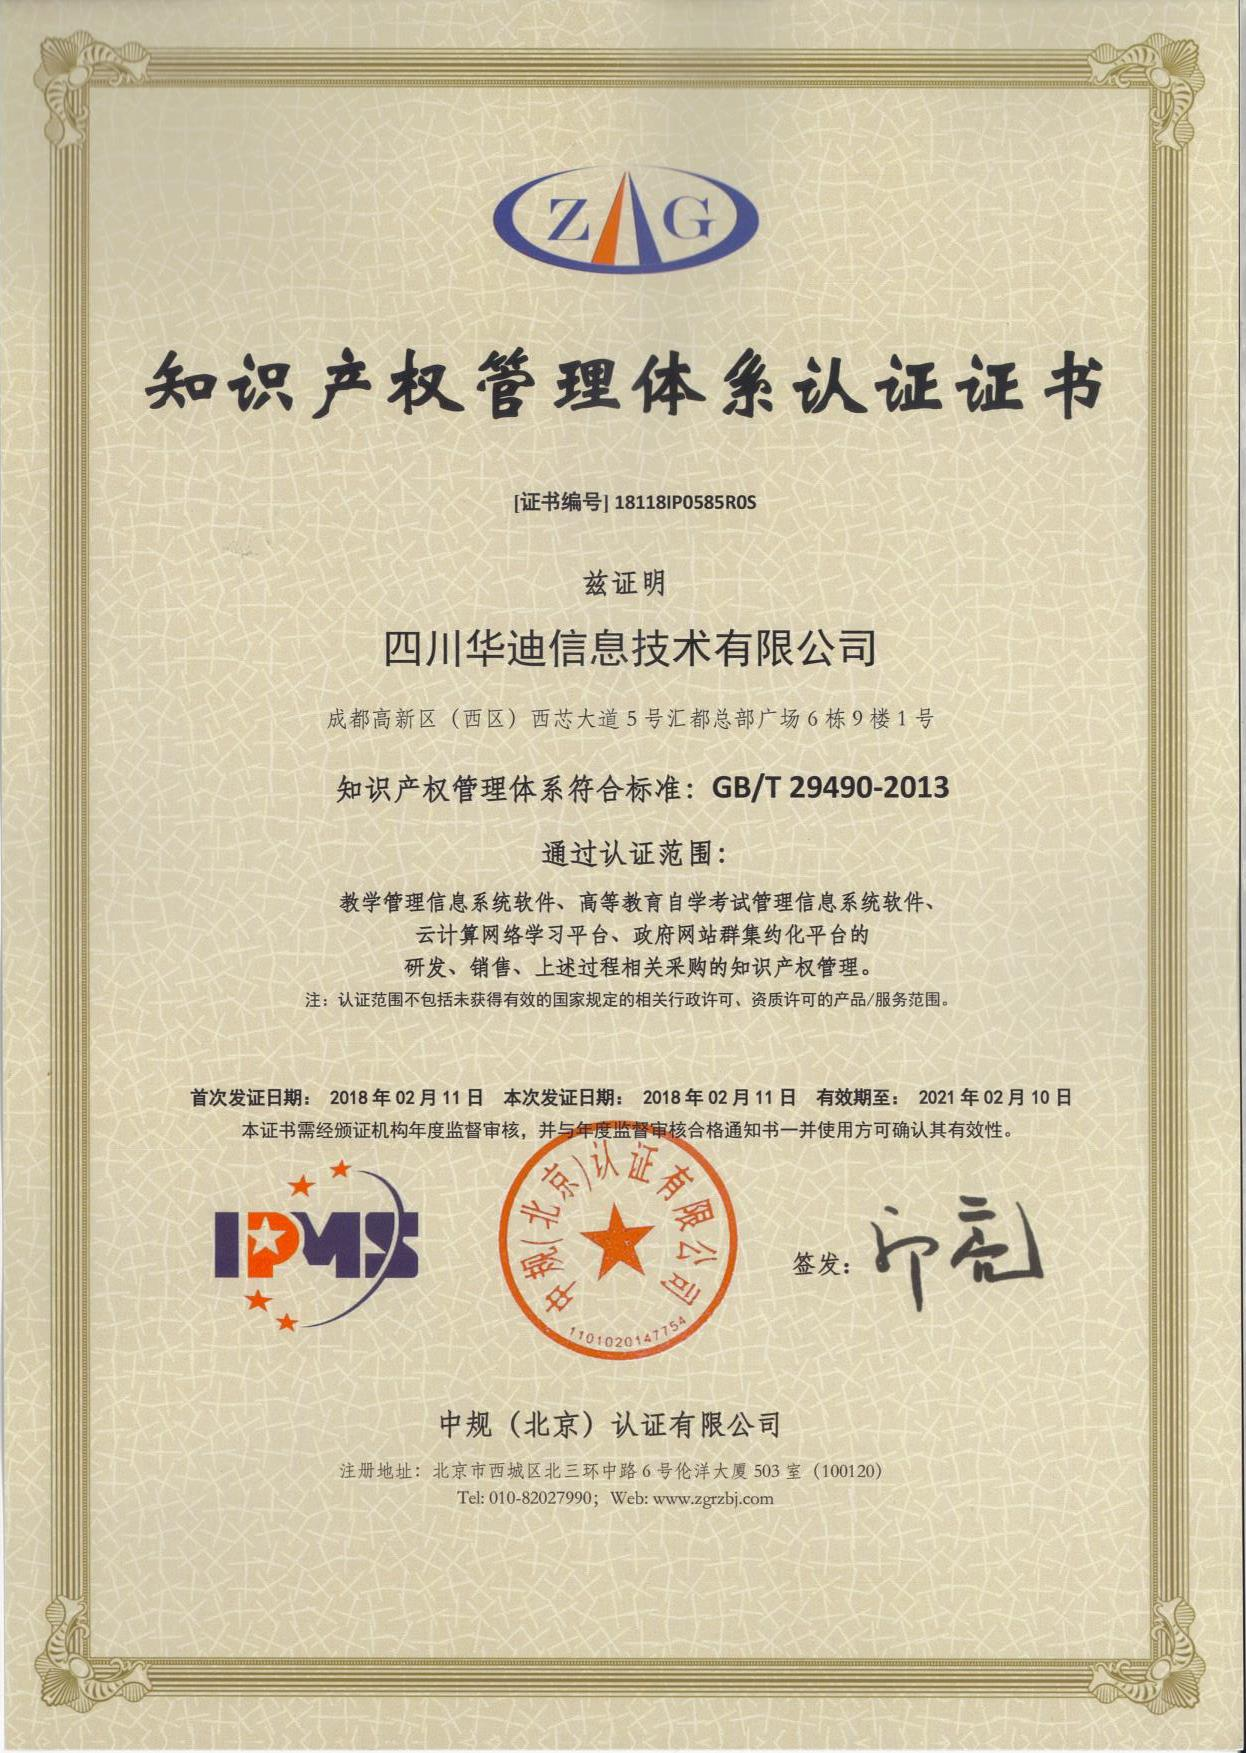 http://www.yundeeonline.com/documents/340939/347035/20180712105746486SSMNFCAV.jpg